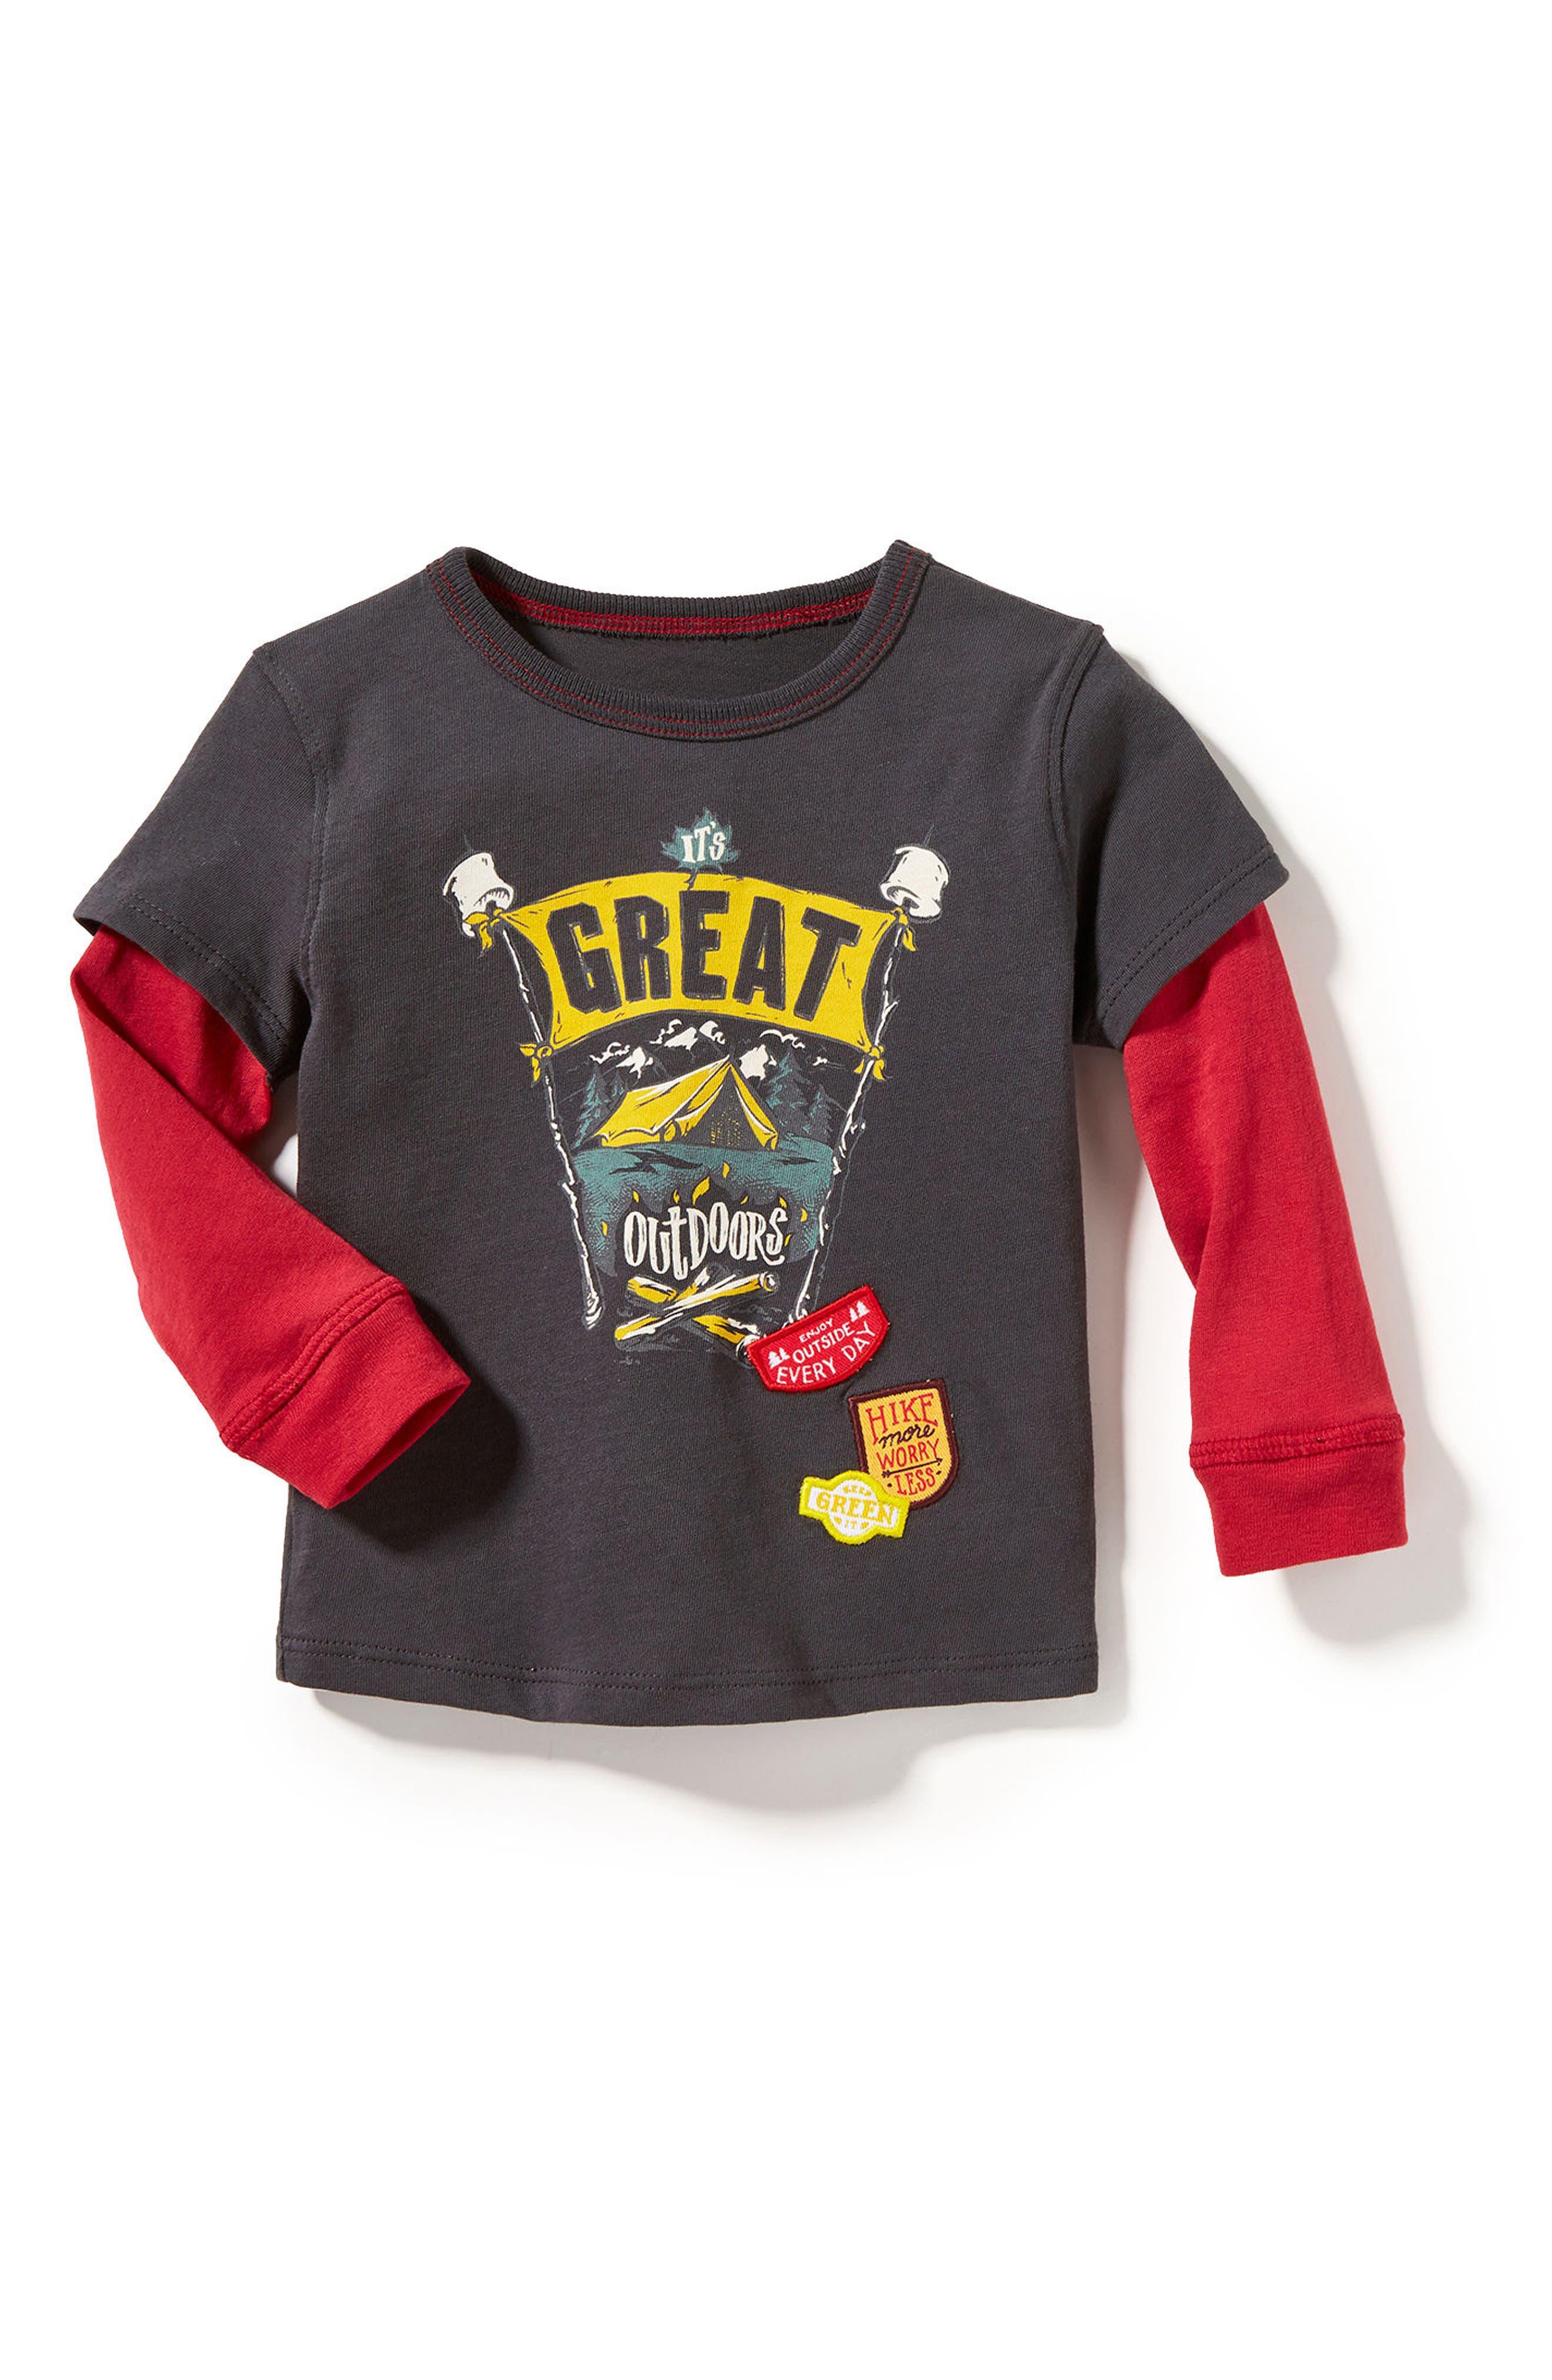 Great Outdoors T-Shirt,                             Main thumbnail 1, color,                             Light Heather Grey